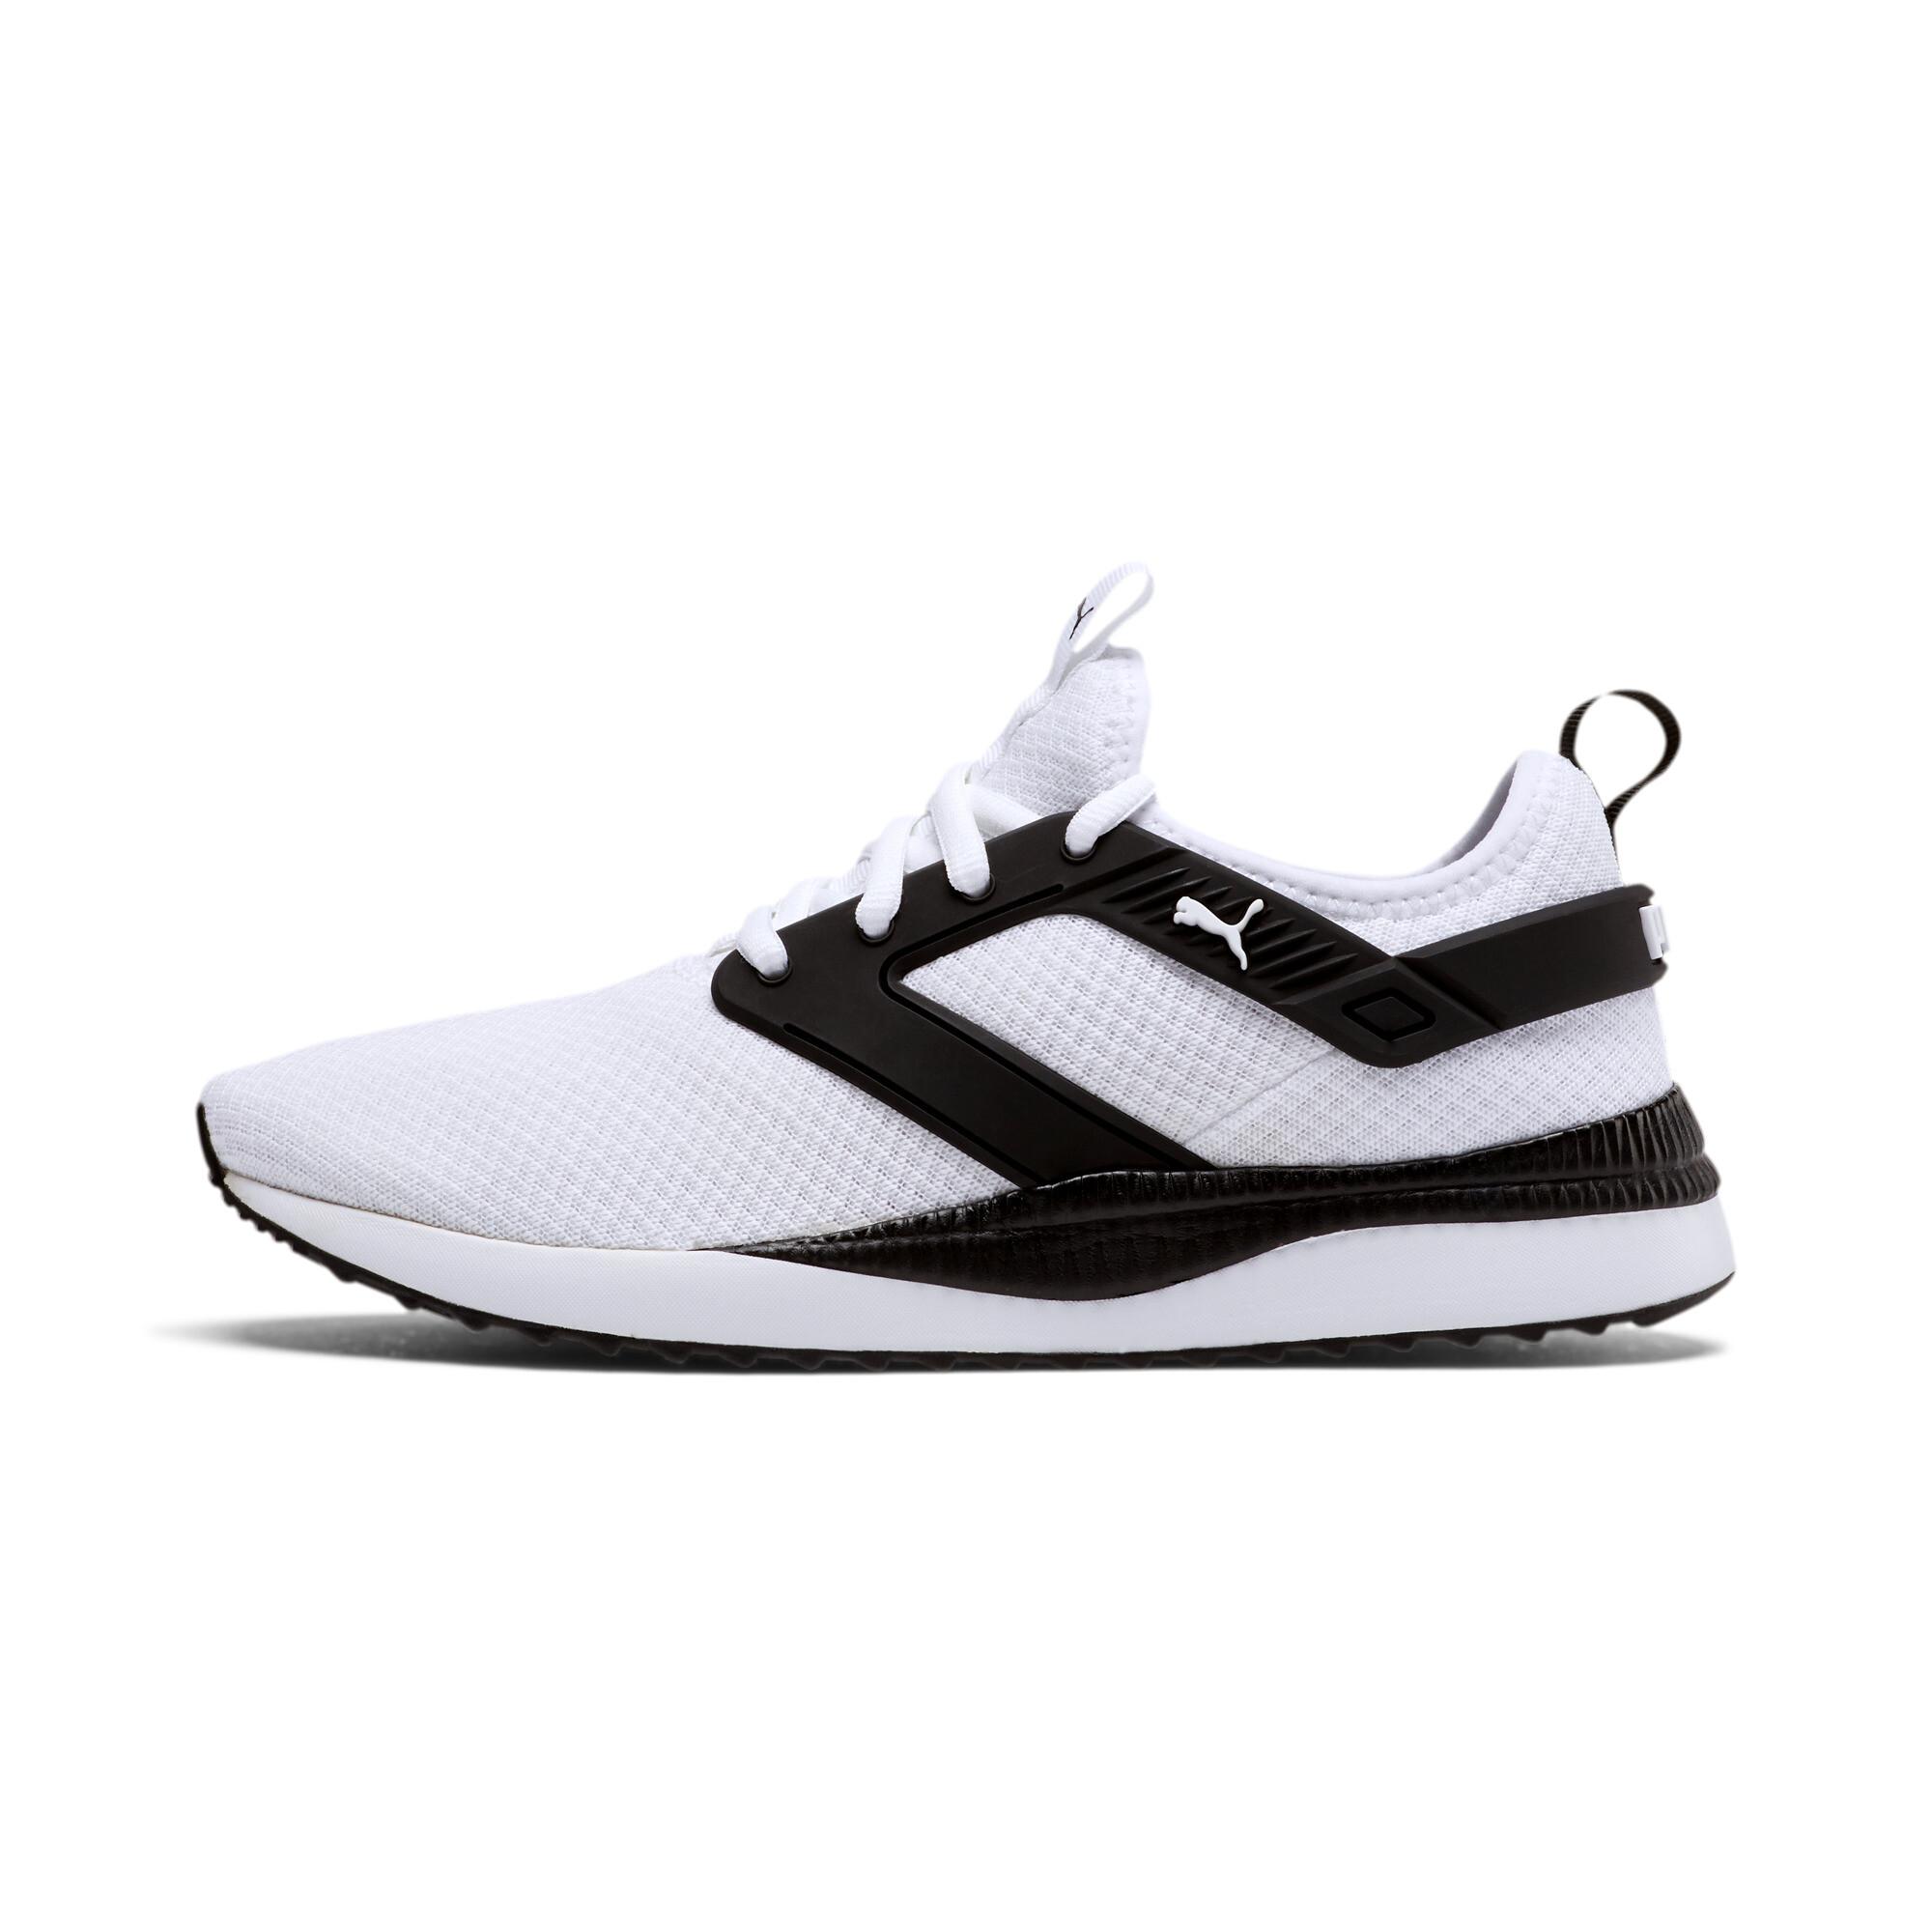 PUMA-Unisex-Pacer-Next-Excel-Mesh-Training-Shoes thumbnail 10